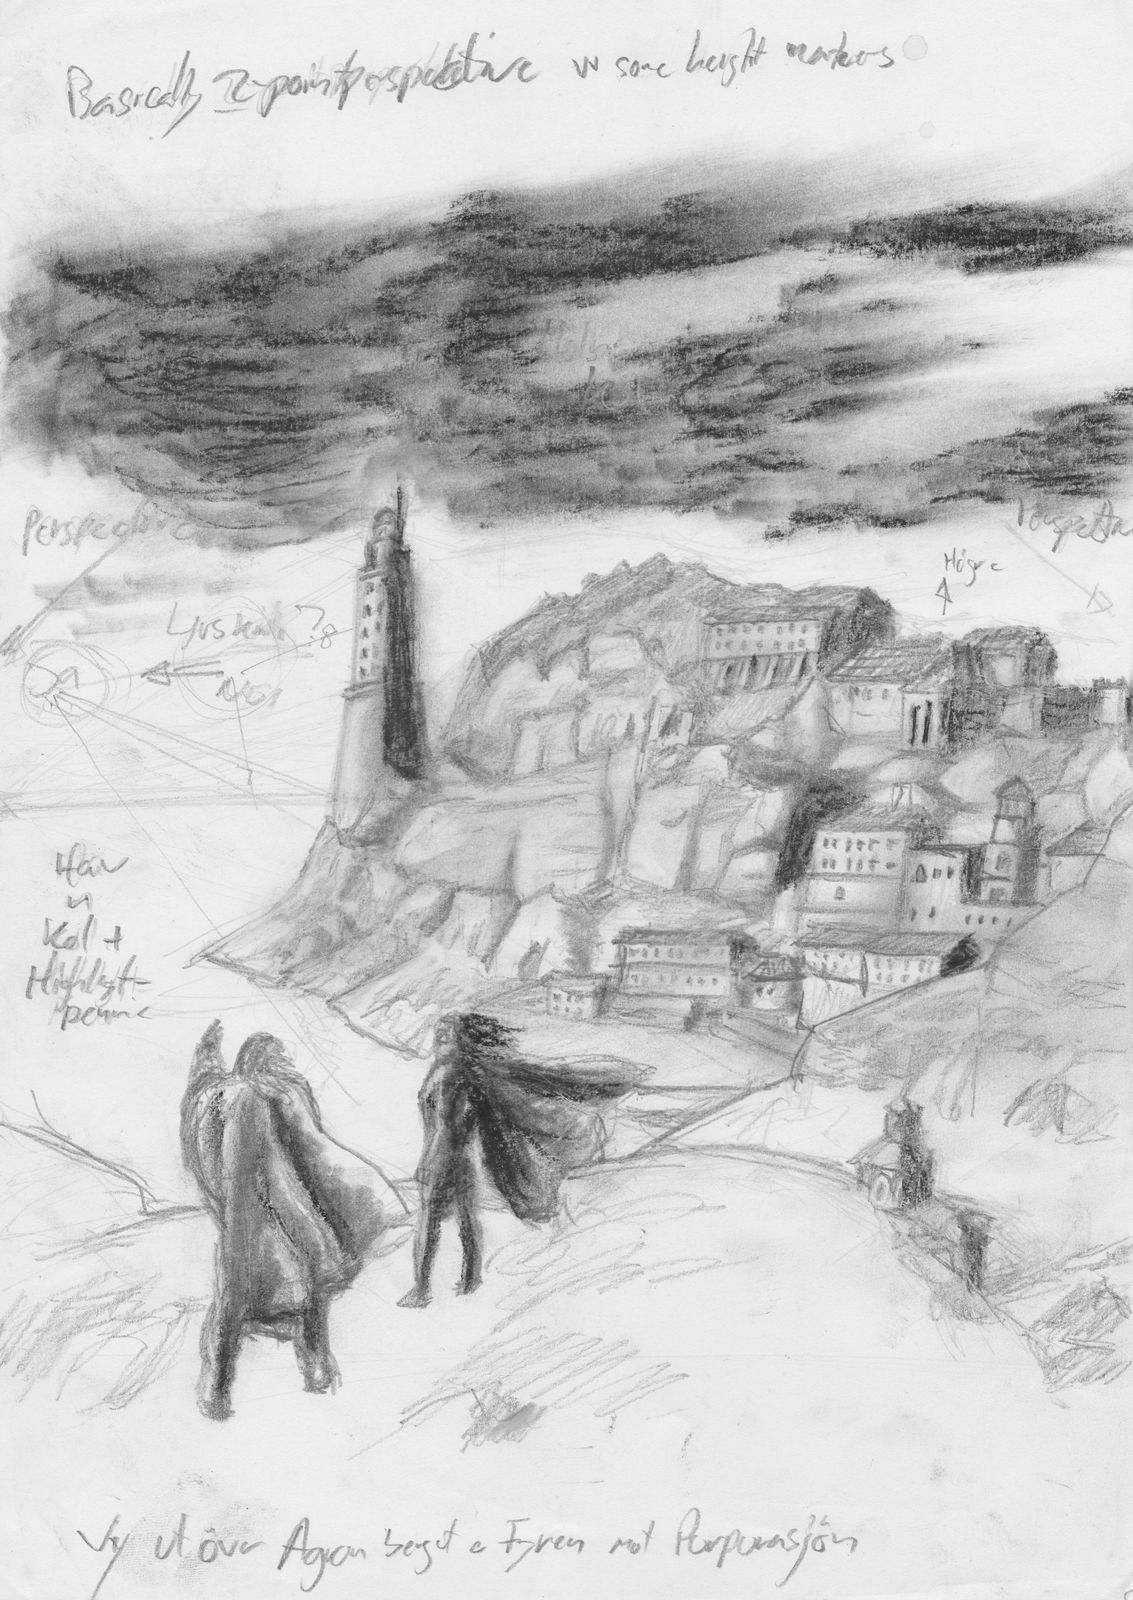 Utkast Storyboard vy från Agron, Fyr, Yakane & Corinna resize